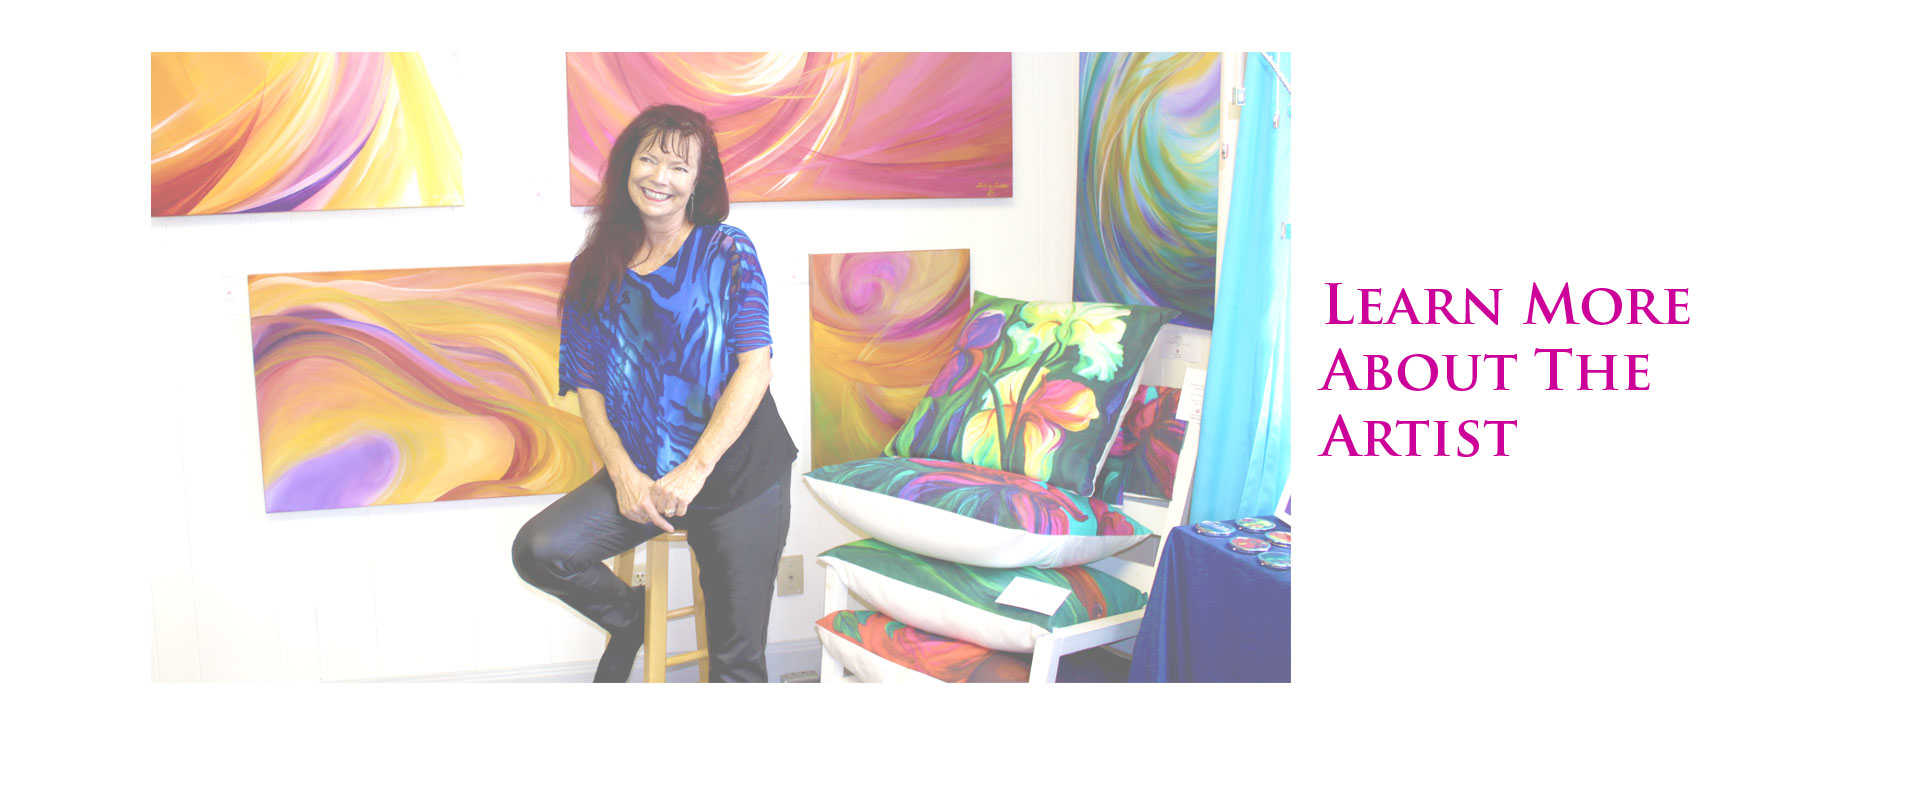 Christine Peterkin Bio / About